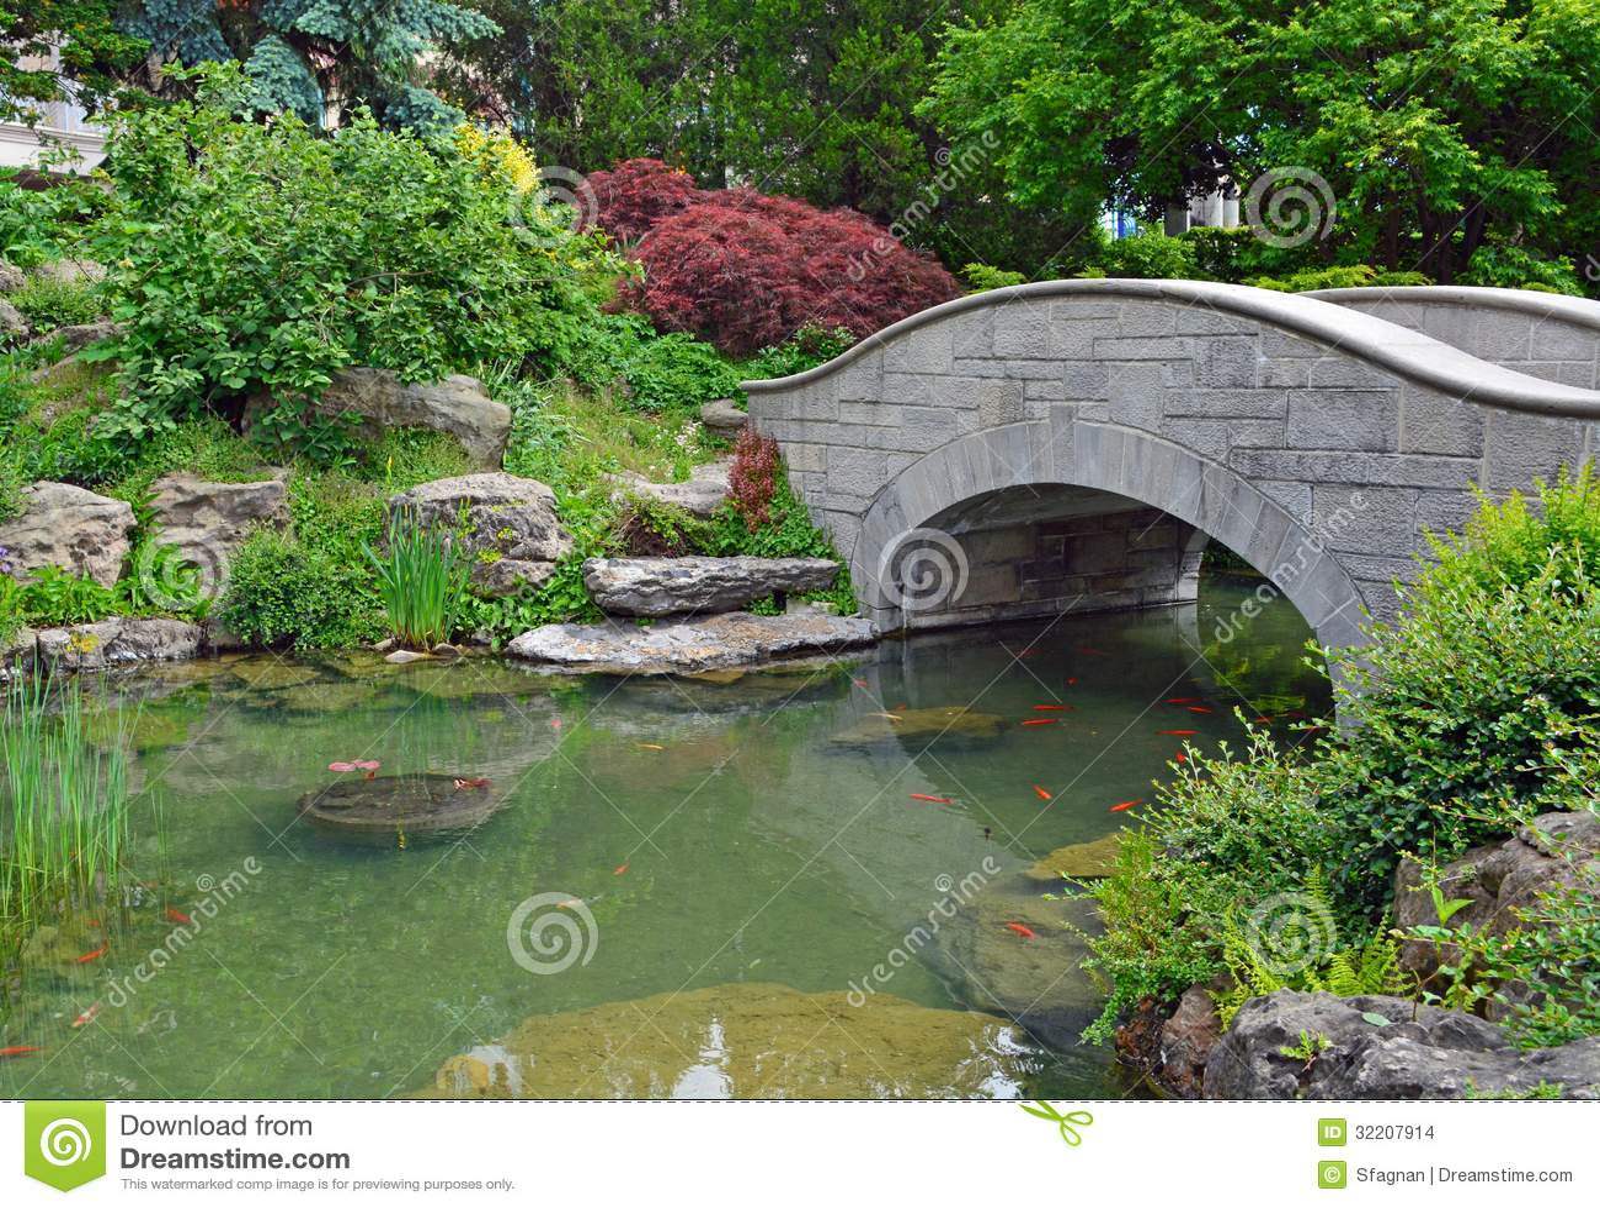 Koi pond stock photo image of pond spring summer for Koi pond quezon city